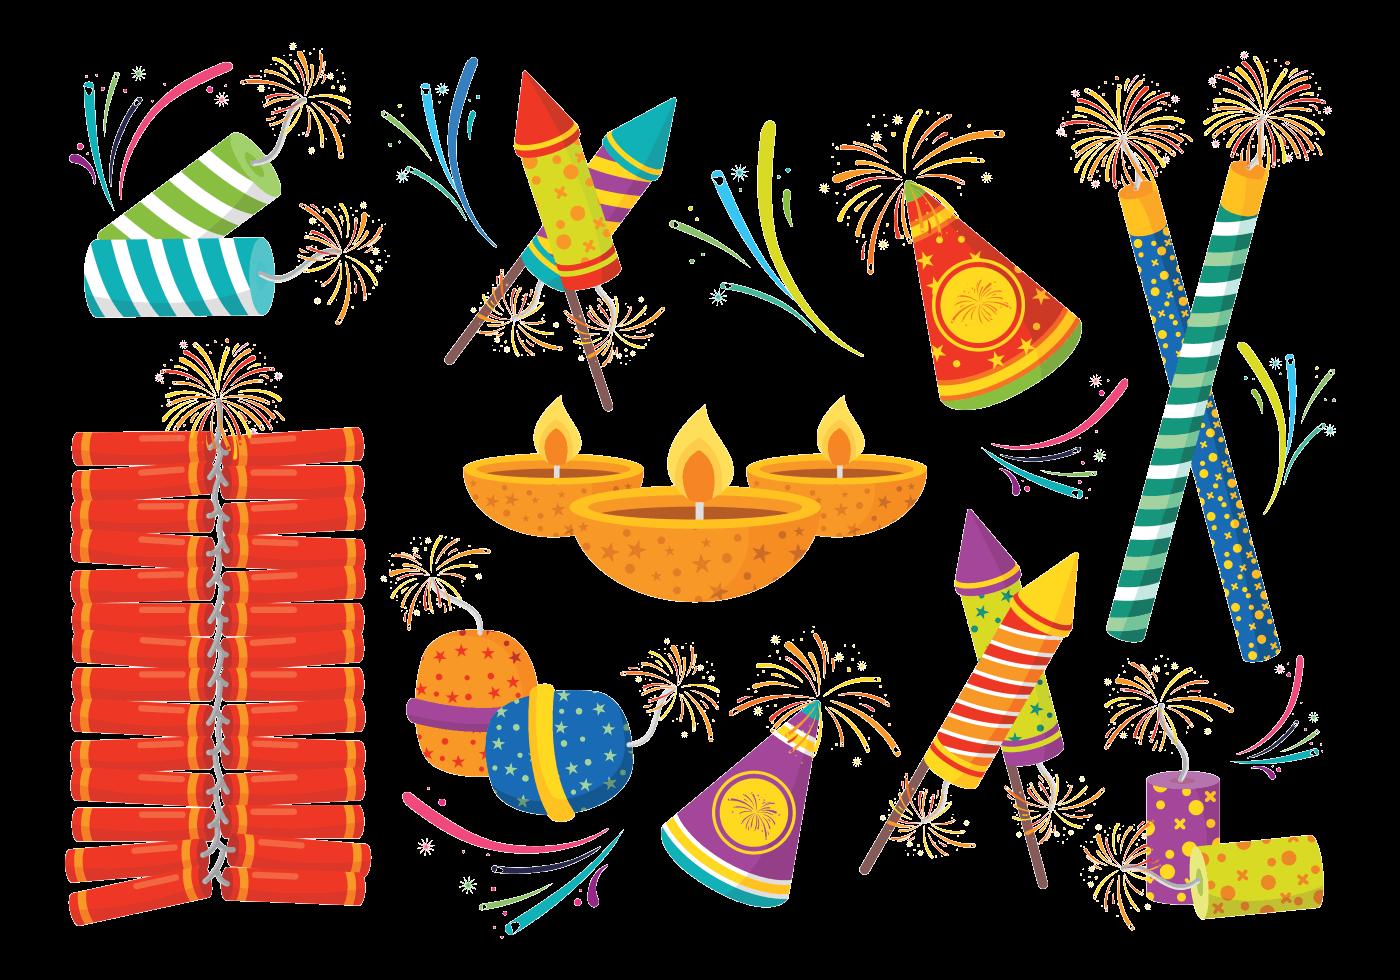 Diwali Hd Png Transparent Diwali Hd Png Images: Diwali Fire Crackers Icons Vector